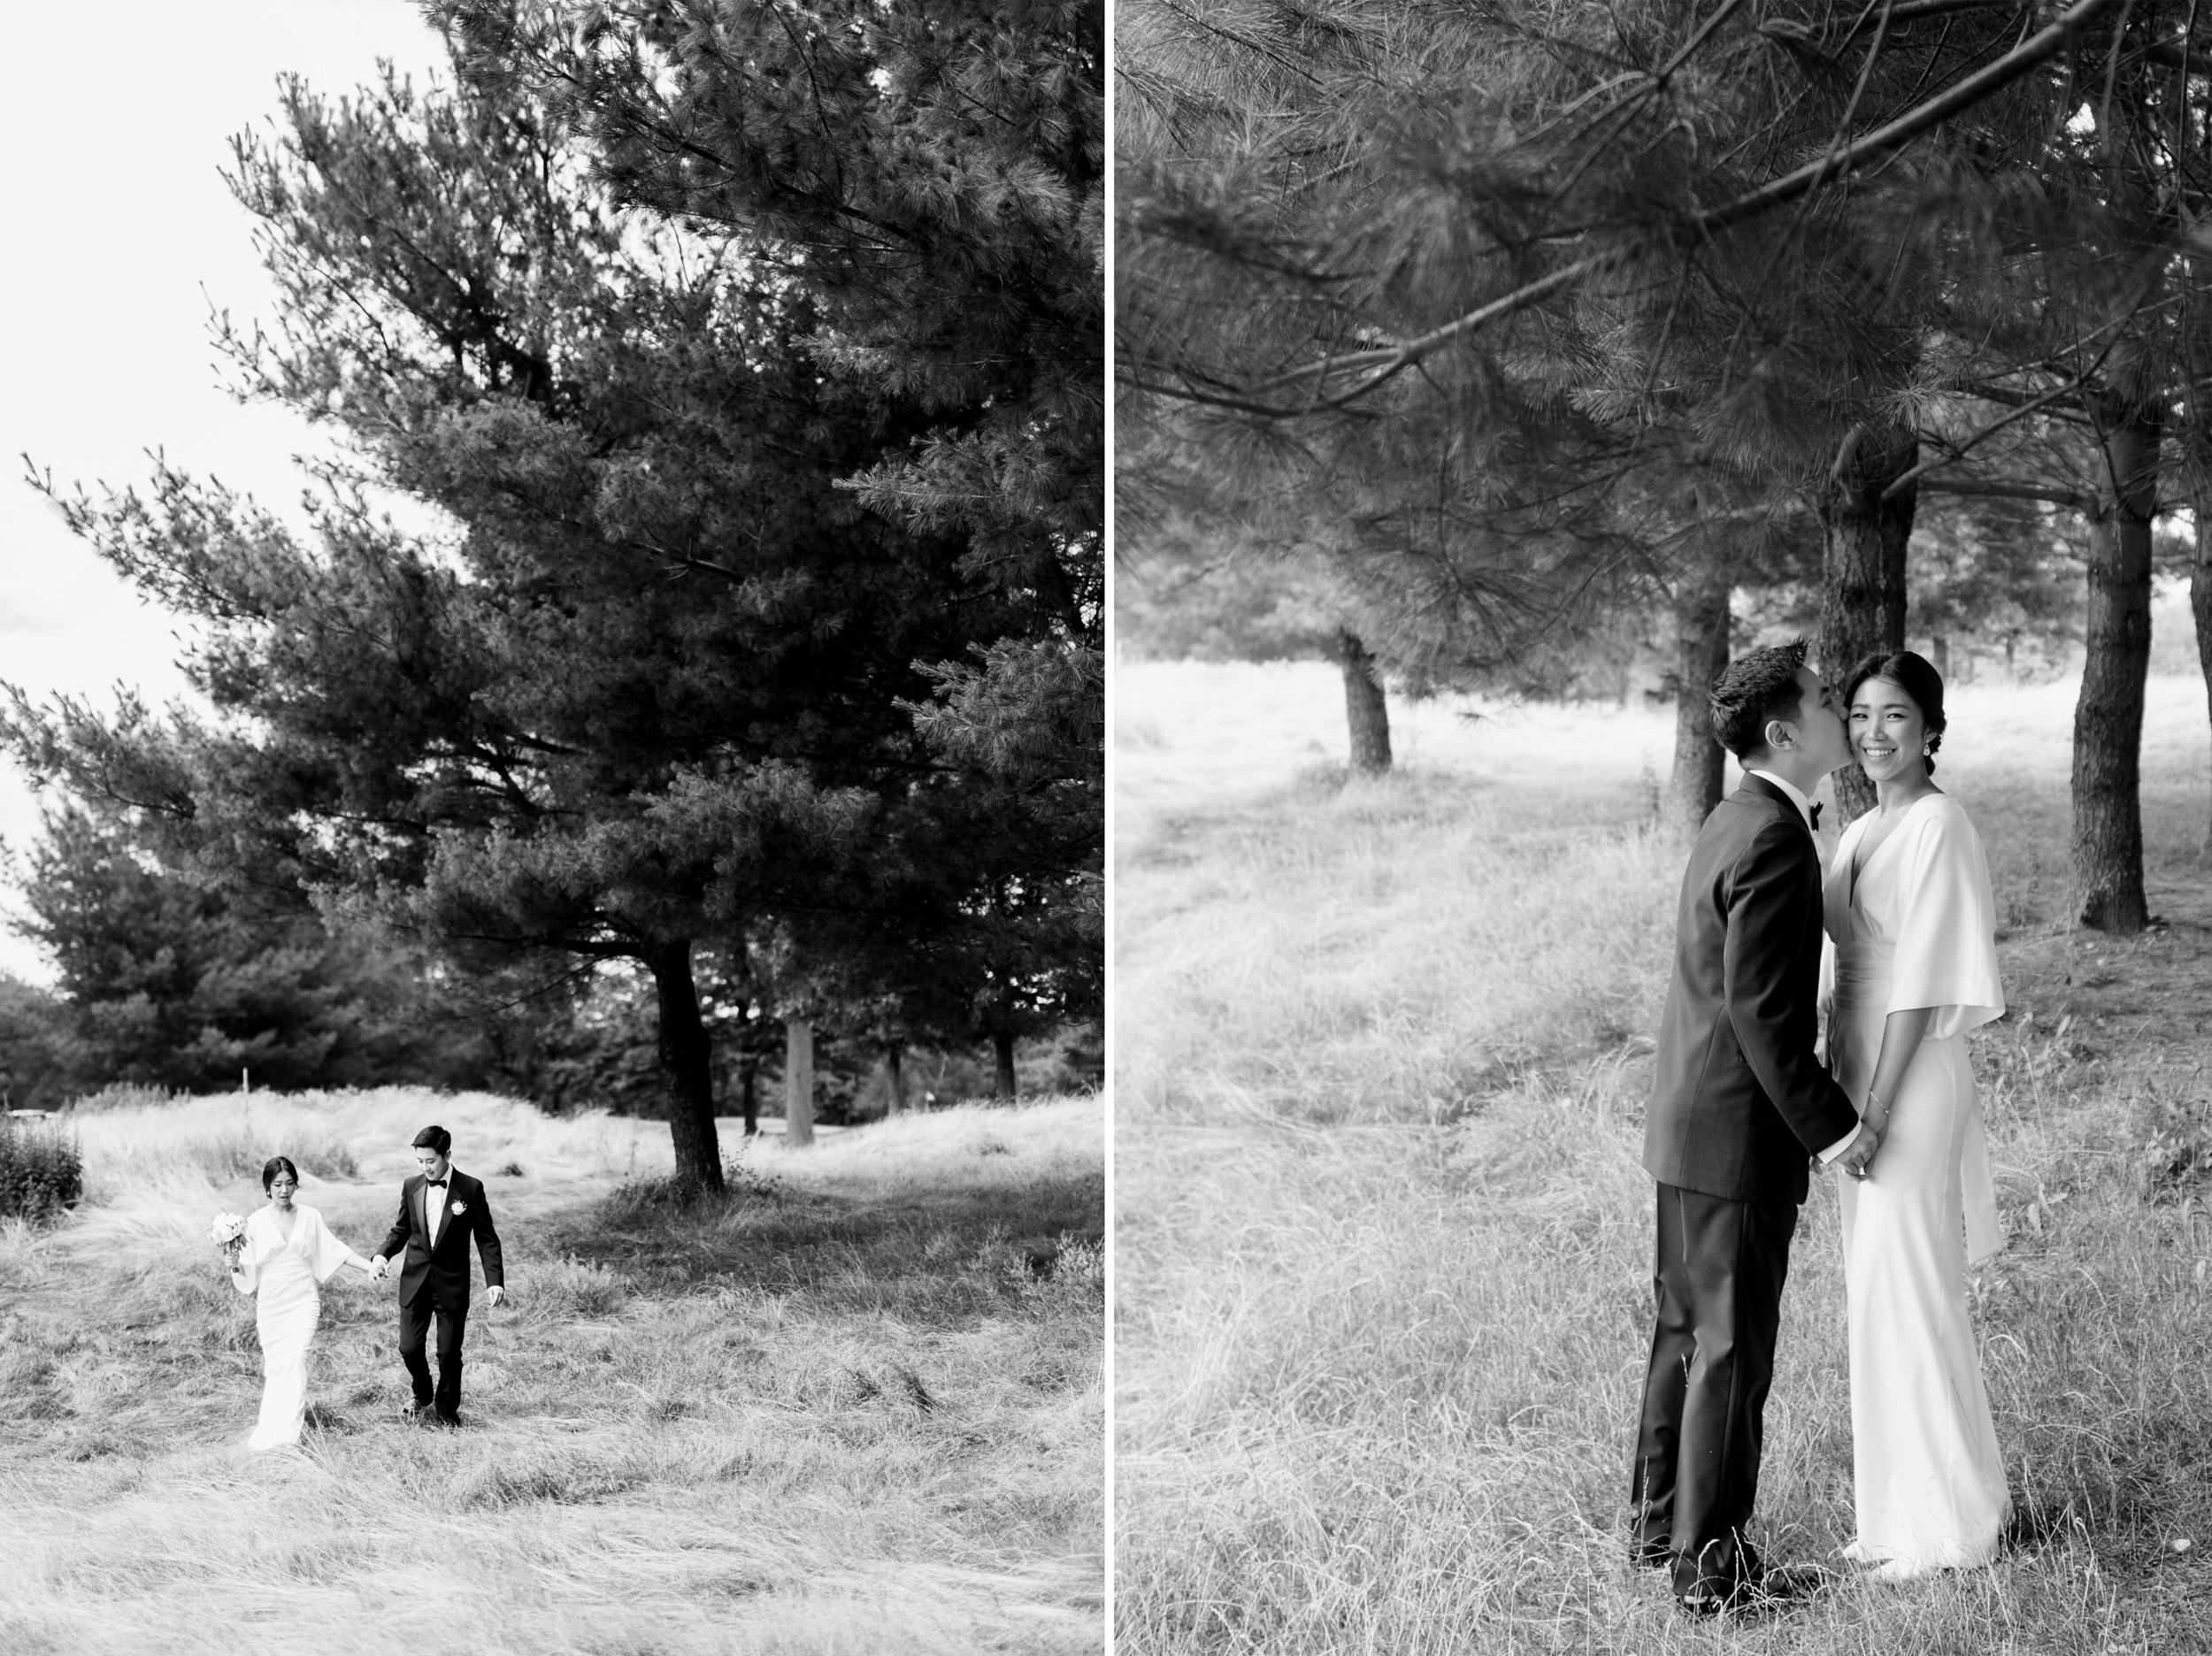 jean-arnold-wedding-0013.jpg